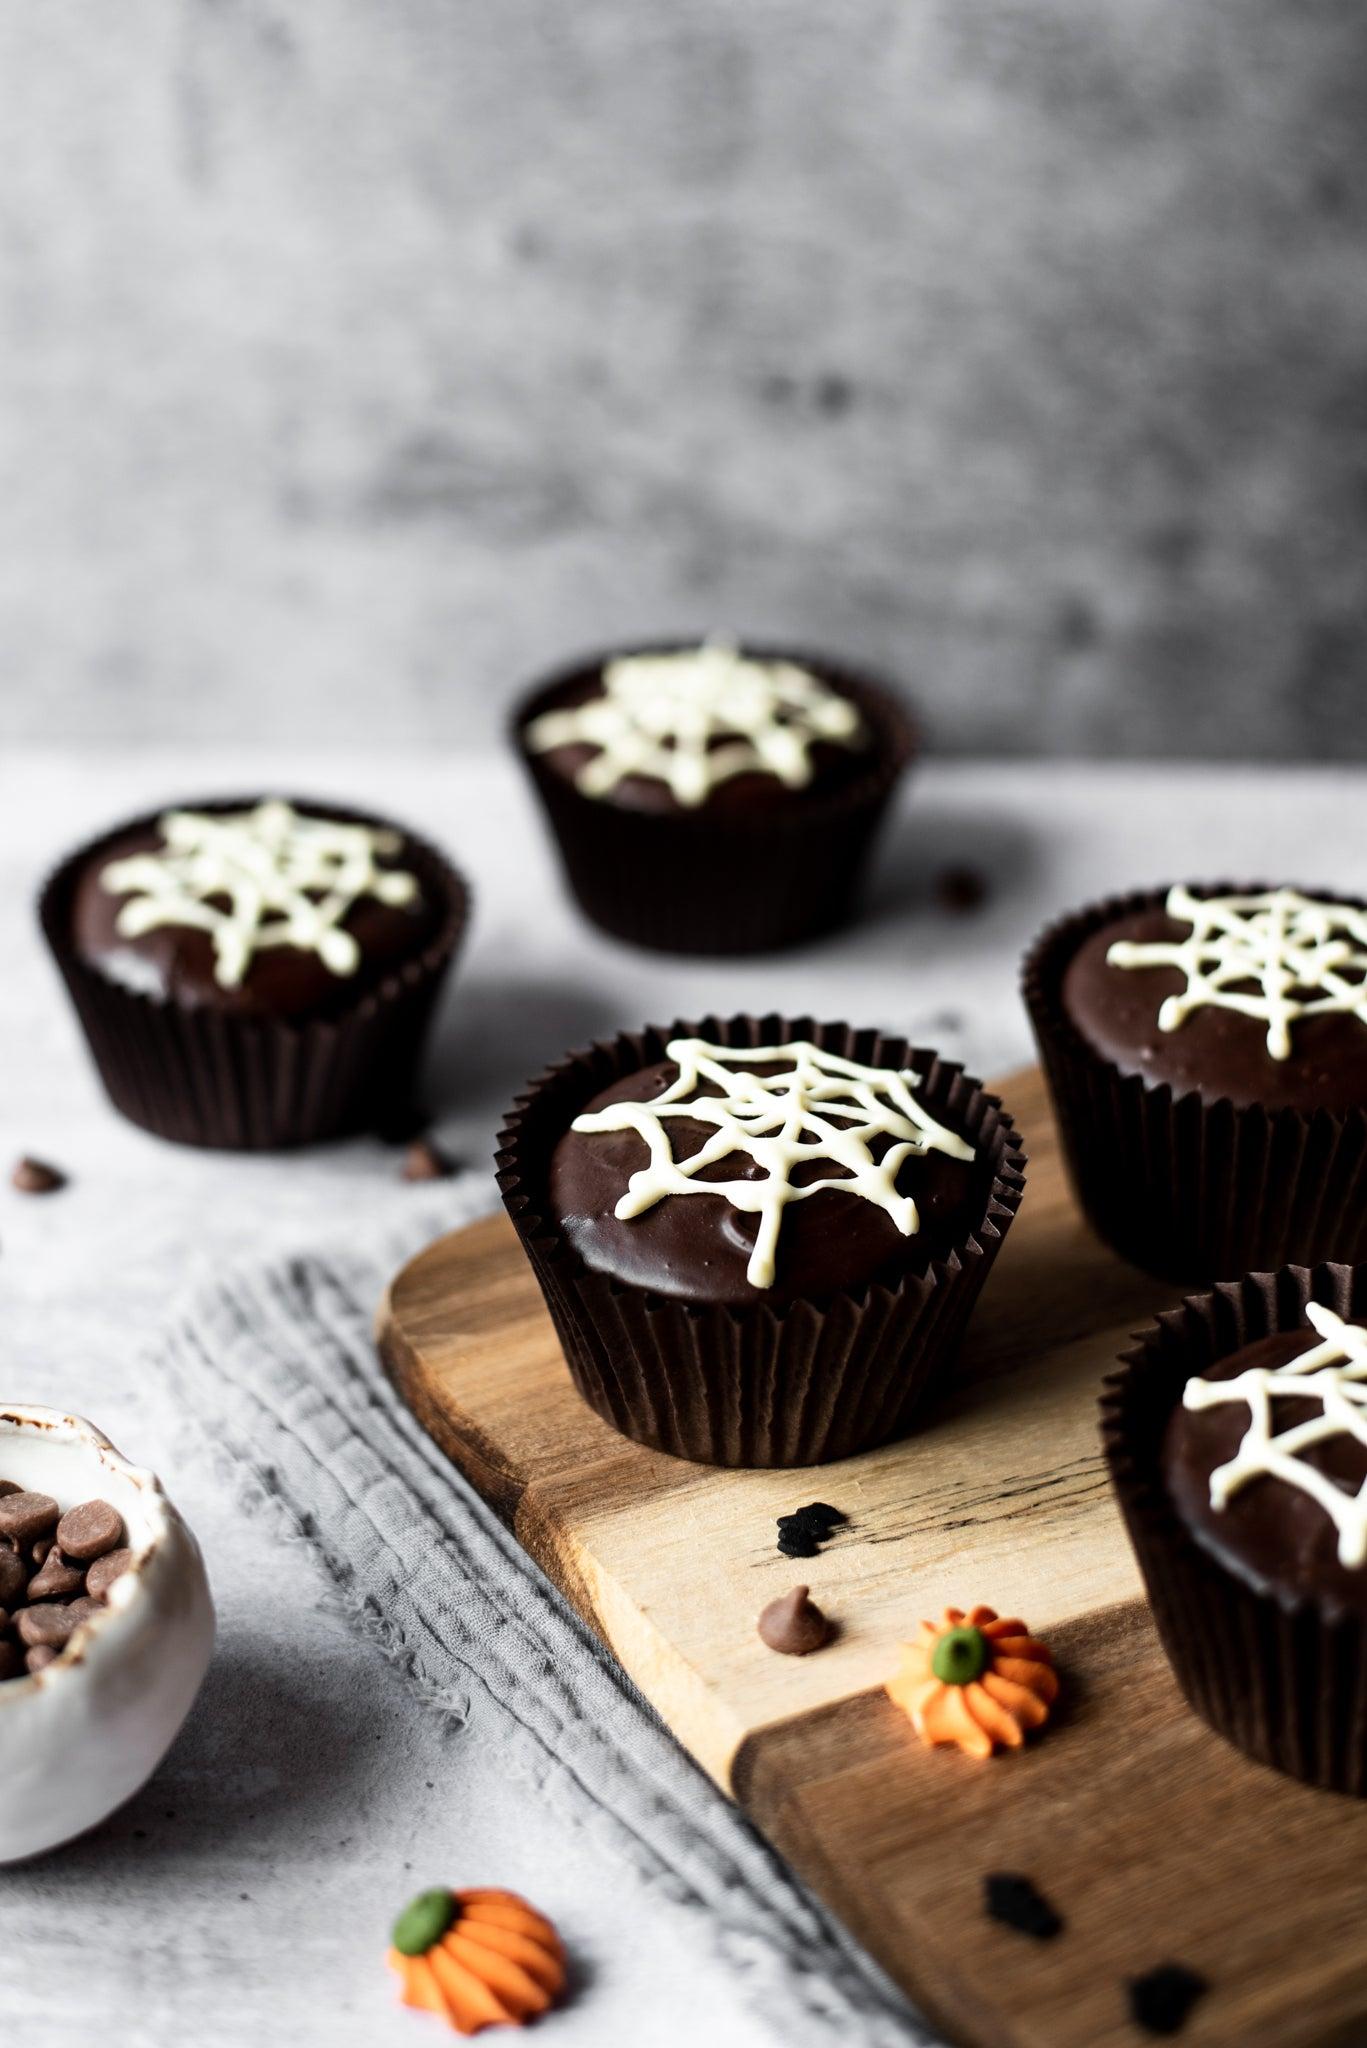 Spider-Web-Cakes-WEB-RES-5.jpg